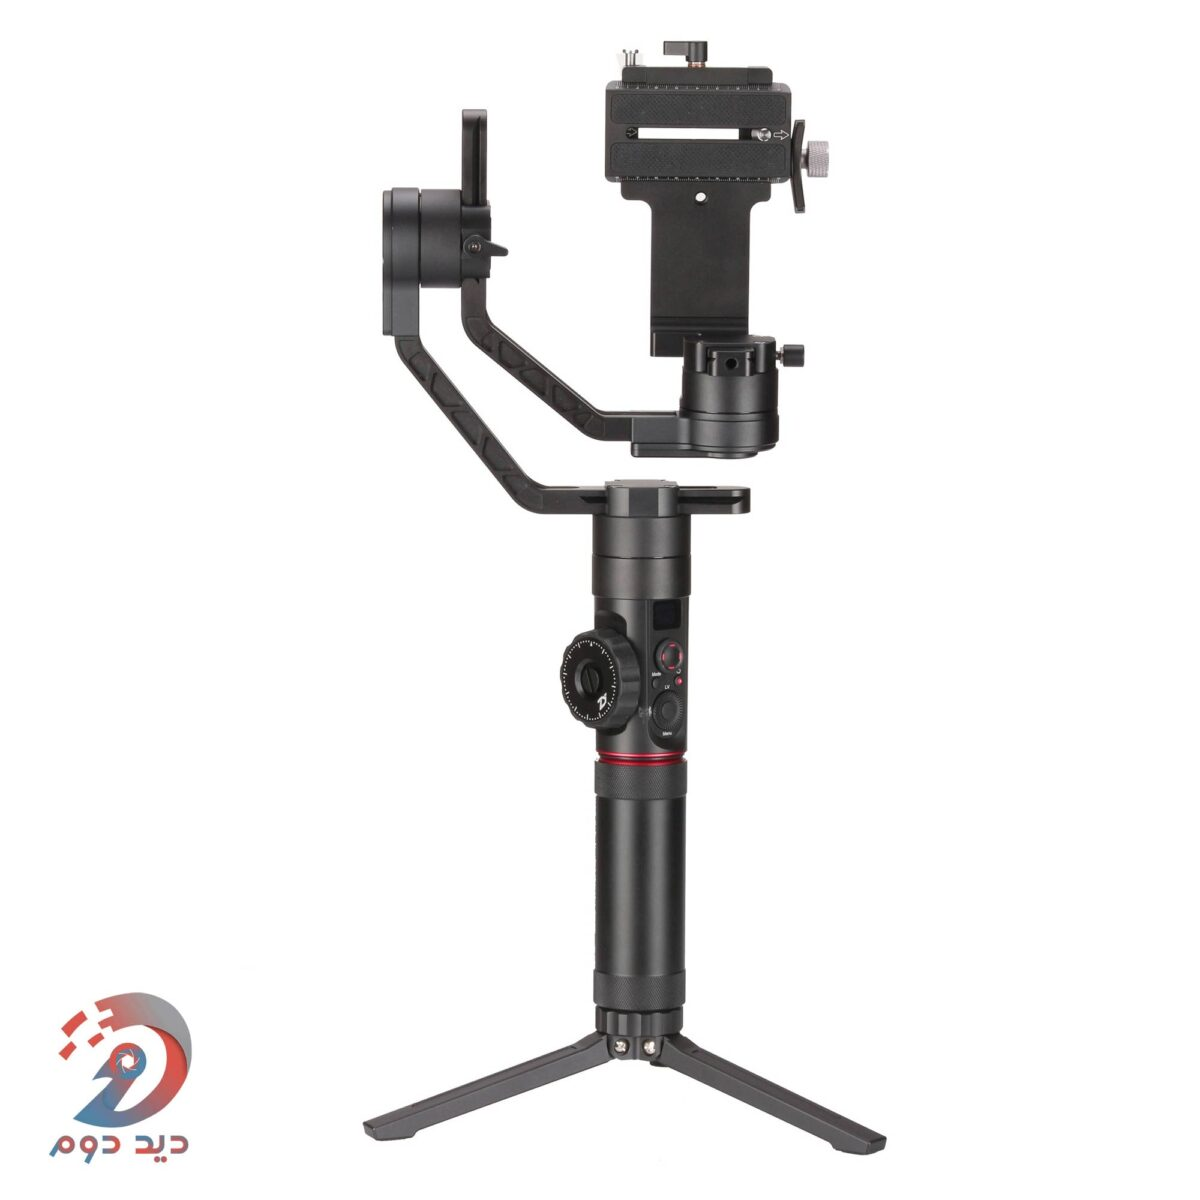 Zhiyun-Tech-Crane-2-Gimbal-Stabilizer